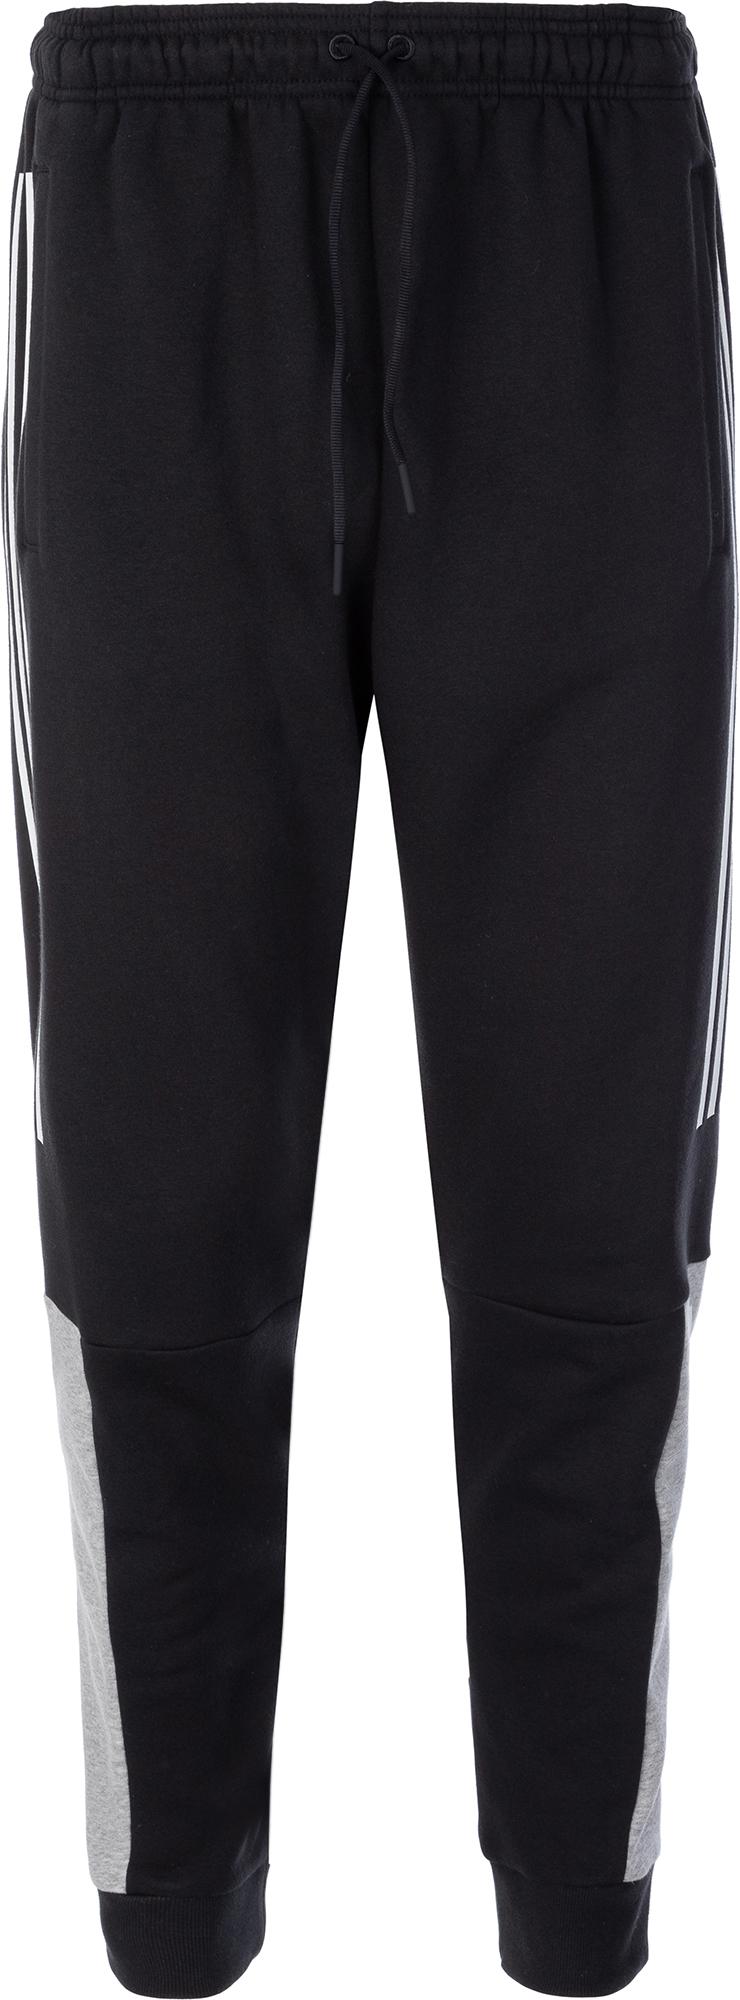 Adidas Брюки мужские Sport ID, размер 56